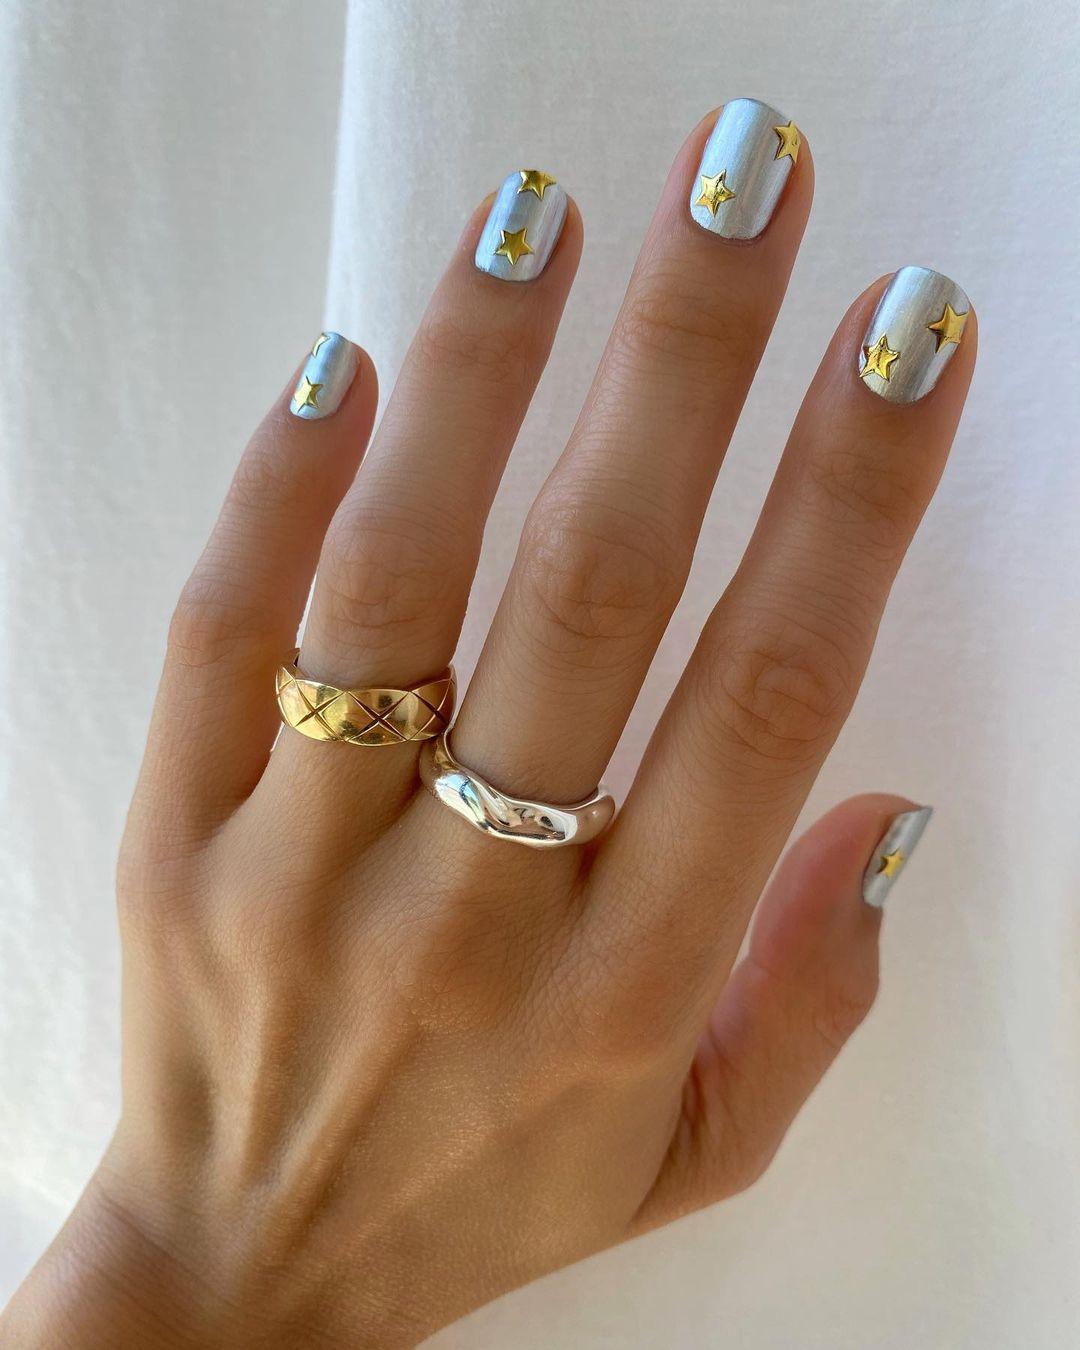 Cute short silver New Years nails with star nail art